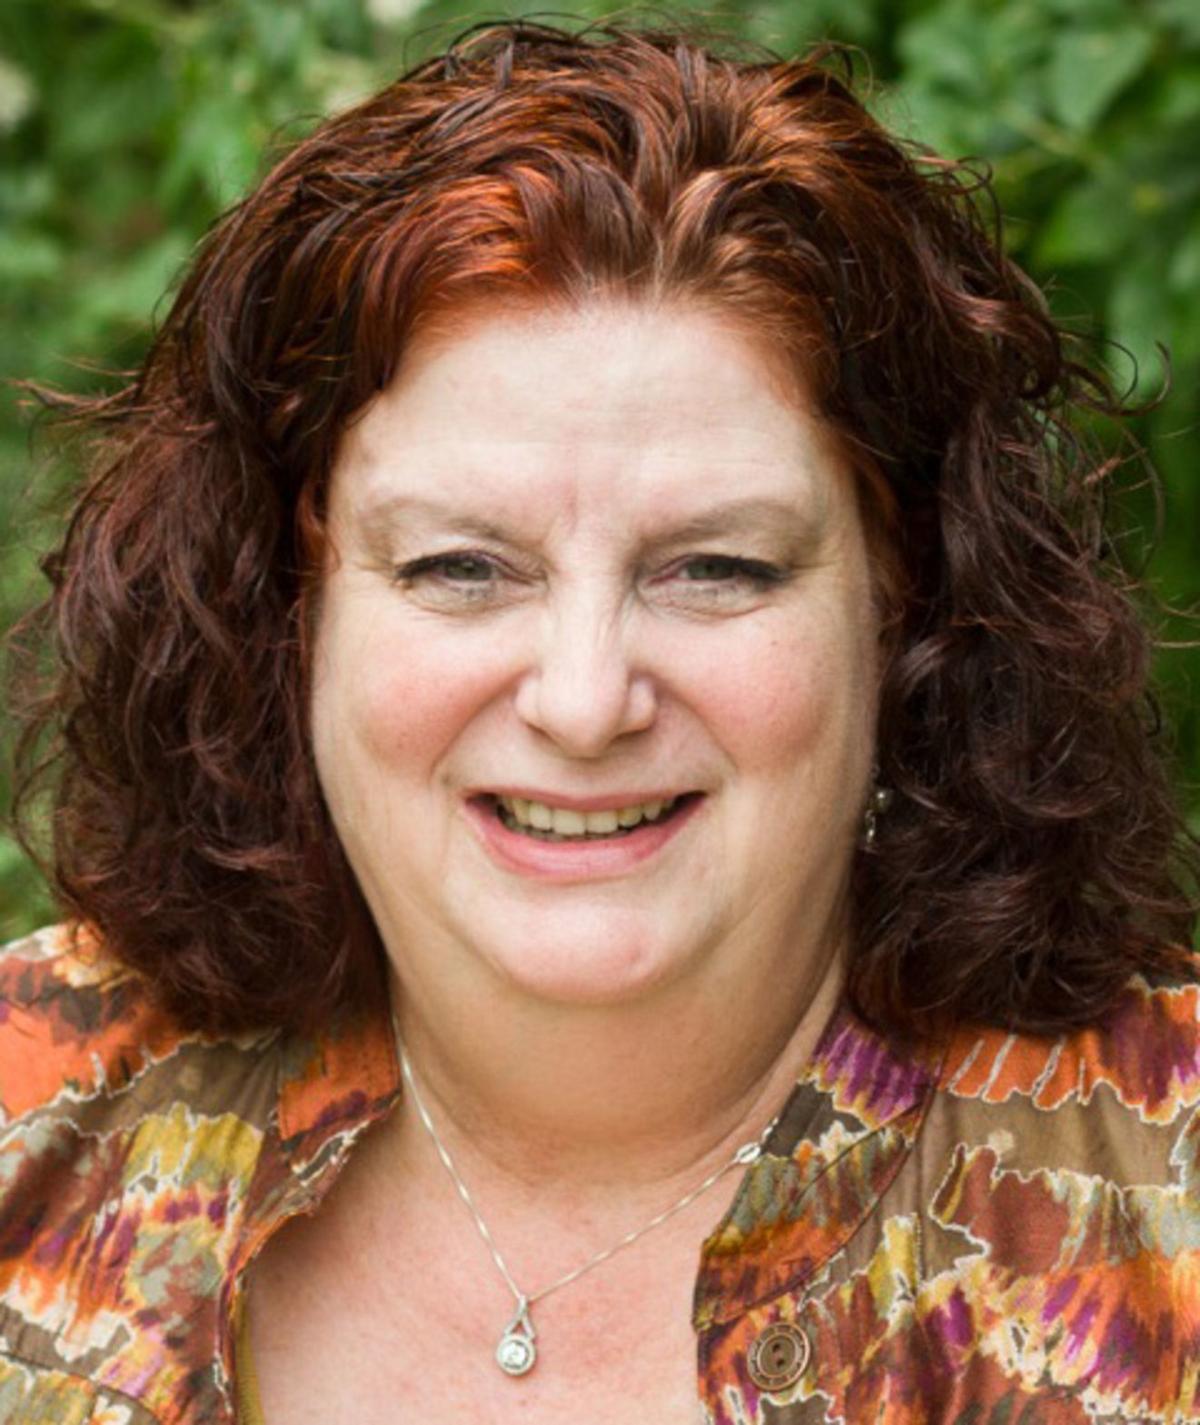 Dr. Annetta Ramsay_12-04-2016_Uid_State_1_1.jpg